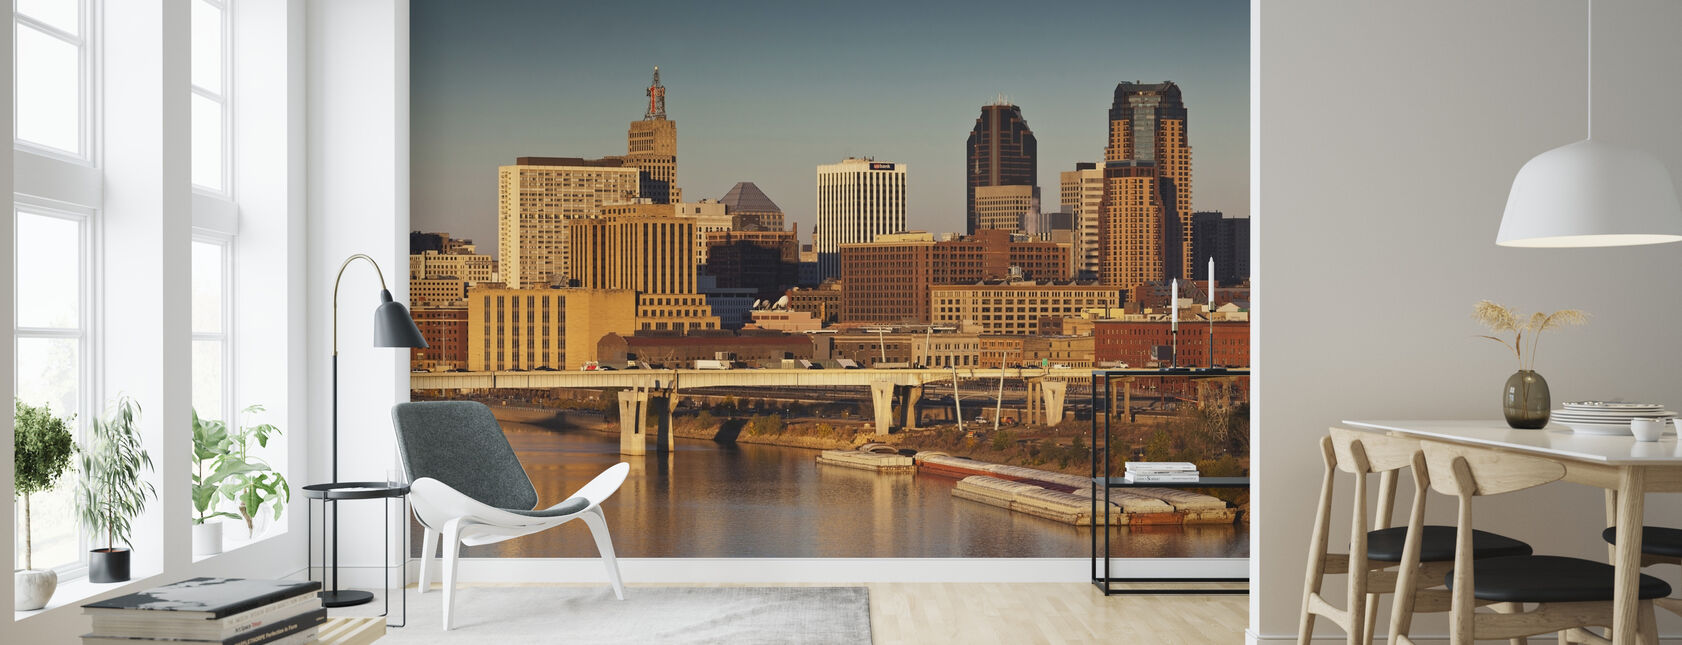 Daggry i Minneapolis - Tapet - Stue